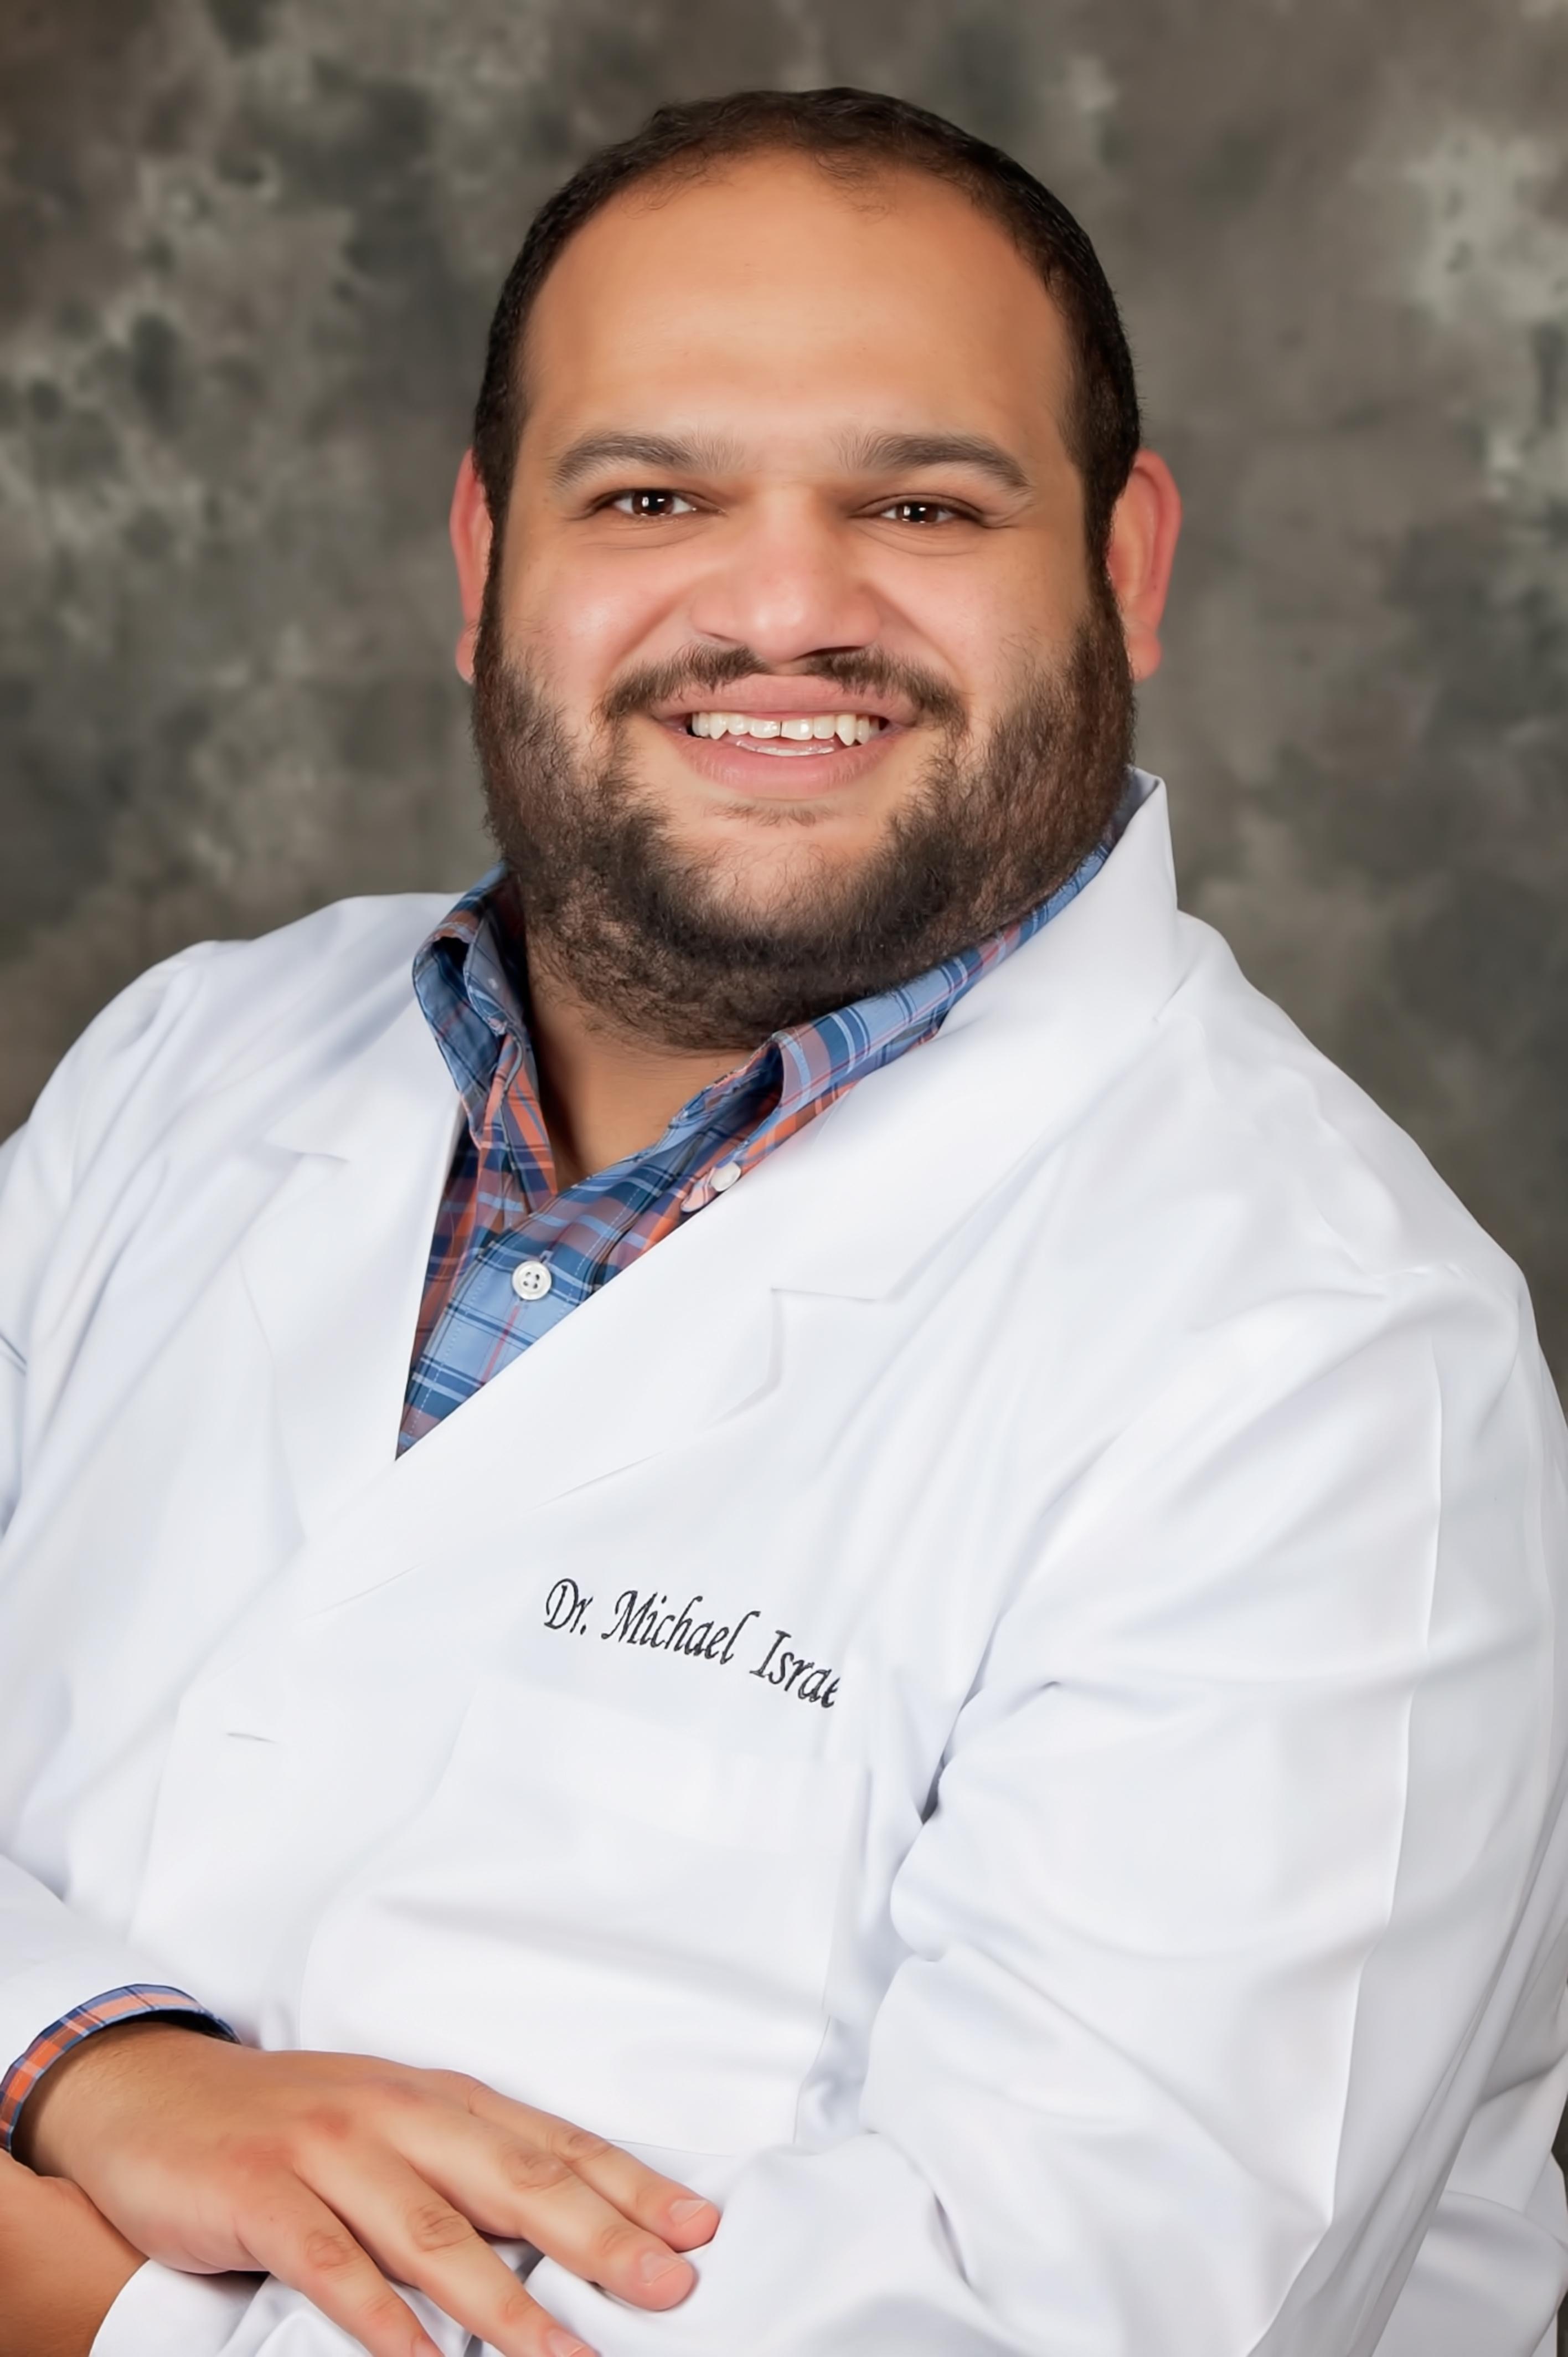 Michael Israel, MD